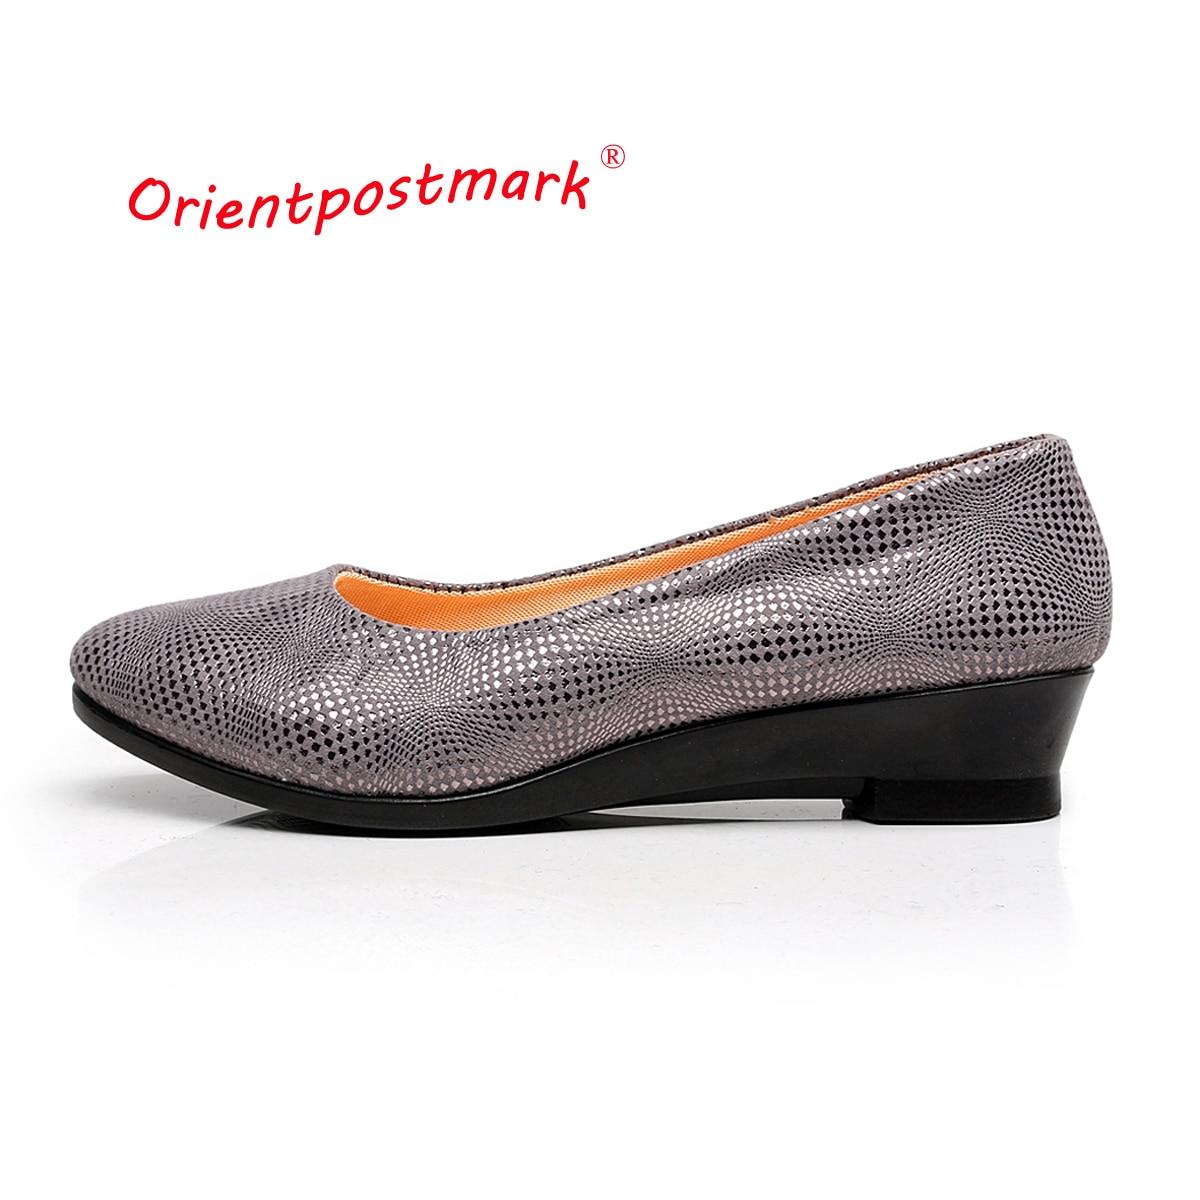 Orientpostmark Women Ballet Pregnant Shoes Work Shoes Women Loafers Slip On Women's Boat Shoes last